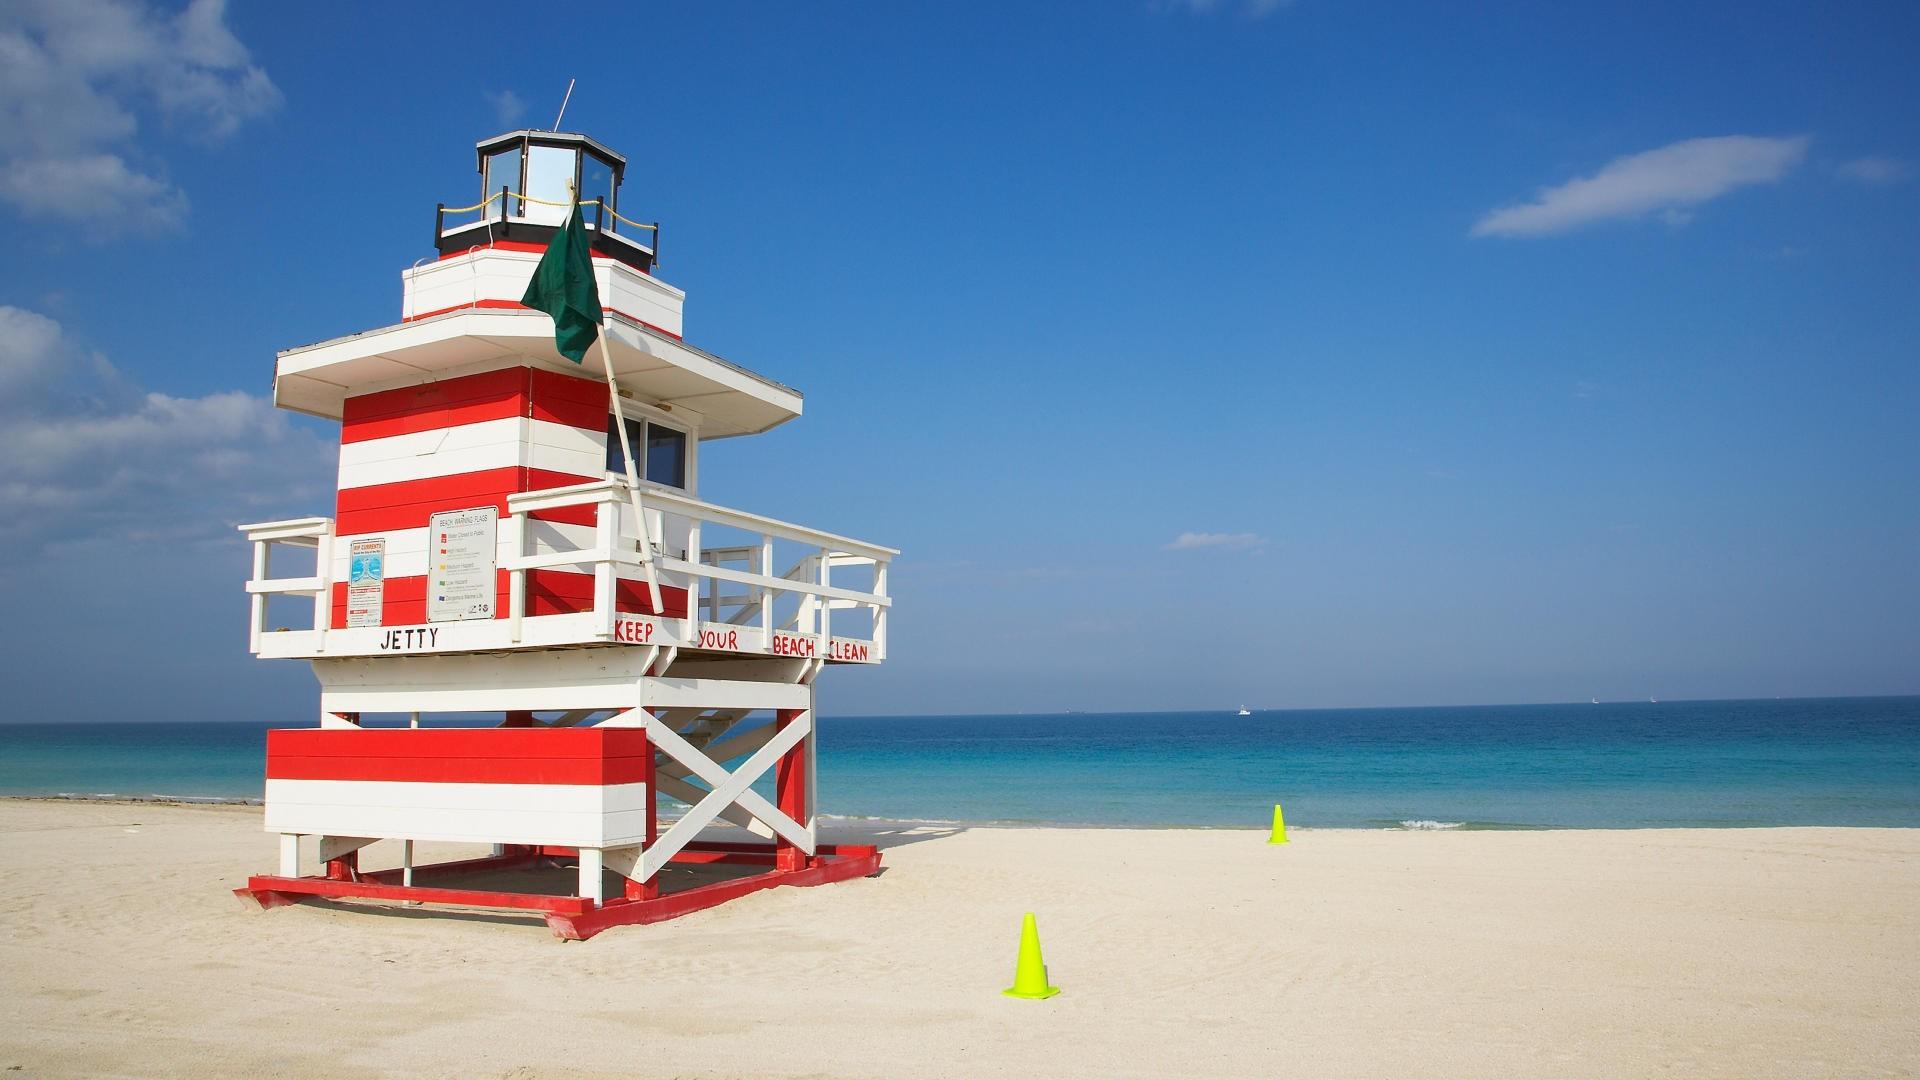 Miami Beach Wallpapers   Download Free Desktop Wallpaper Images .